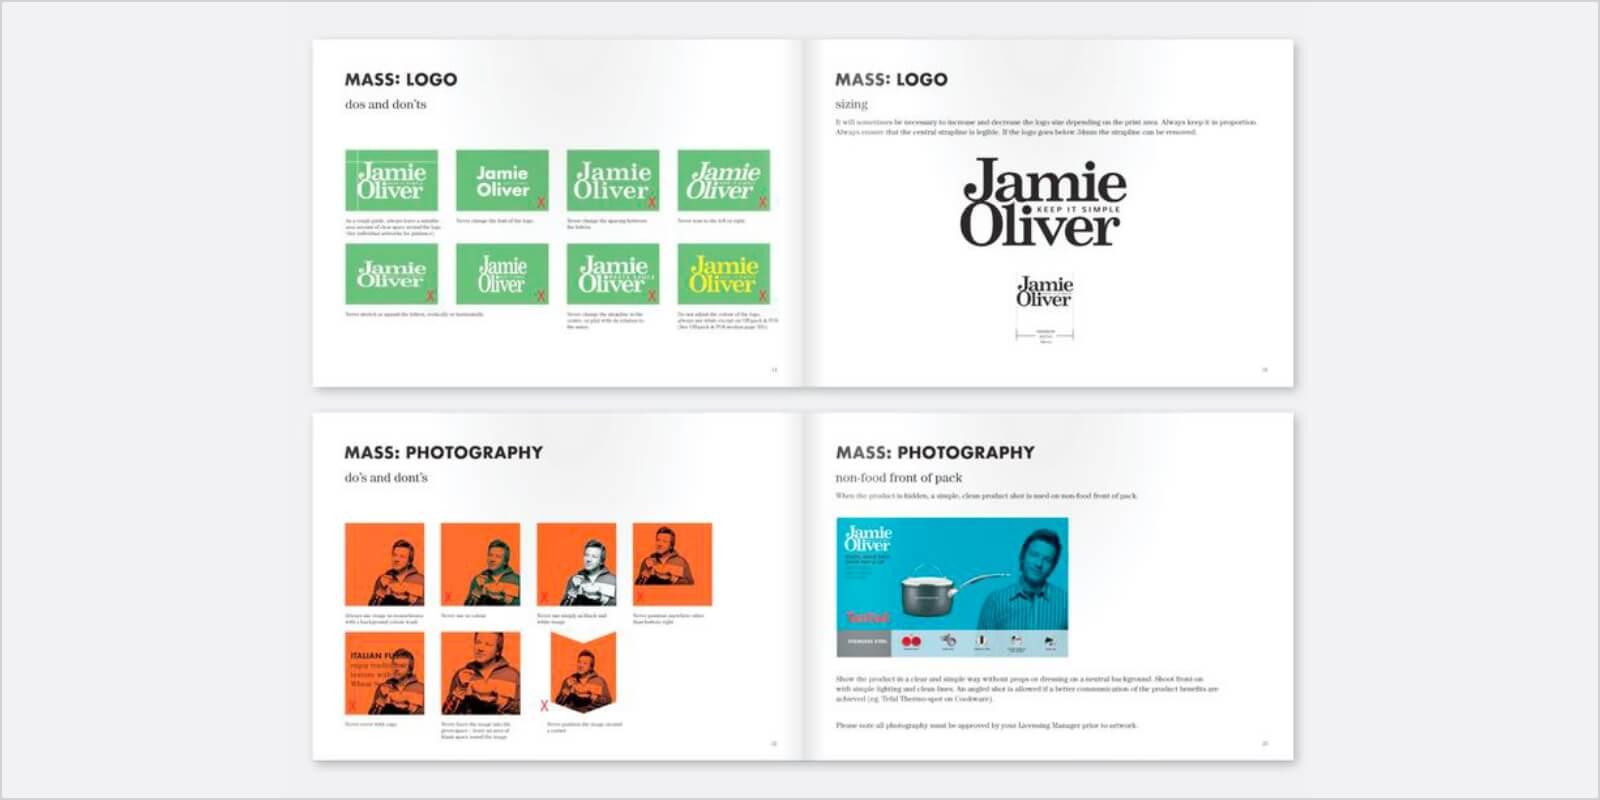 Jamie Oliver Brand Guidelines